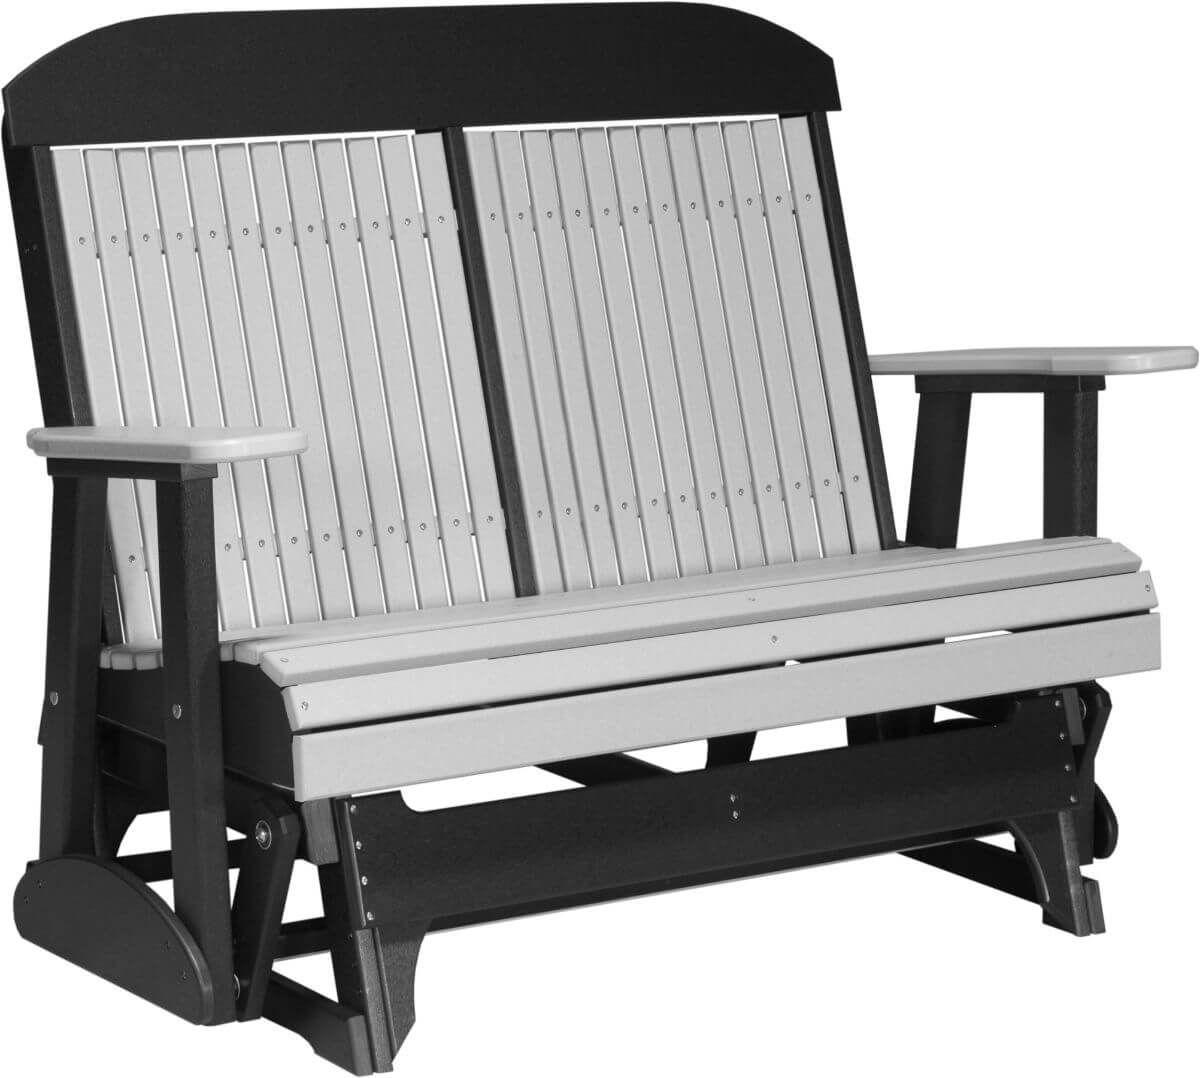 Dove Gray and Black Stockton Outdoor Glider Bench